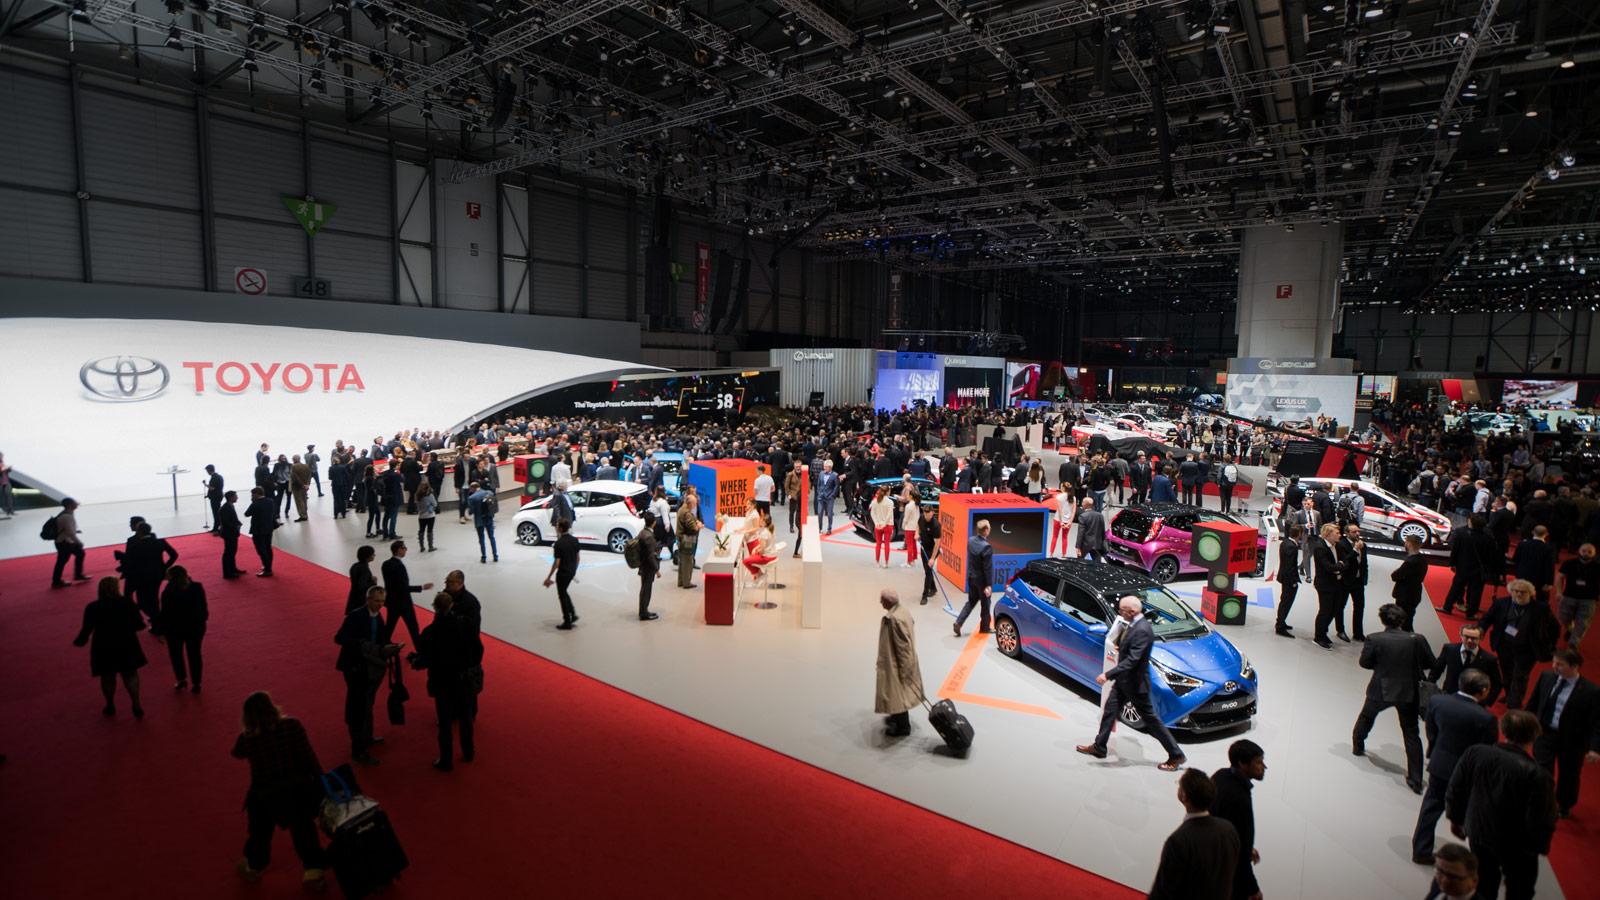 Toyota at the 2018 Geneva Motor Show